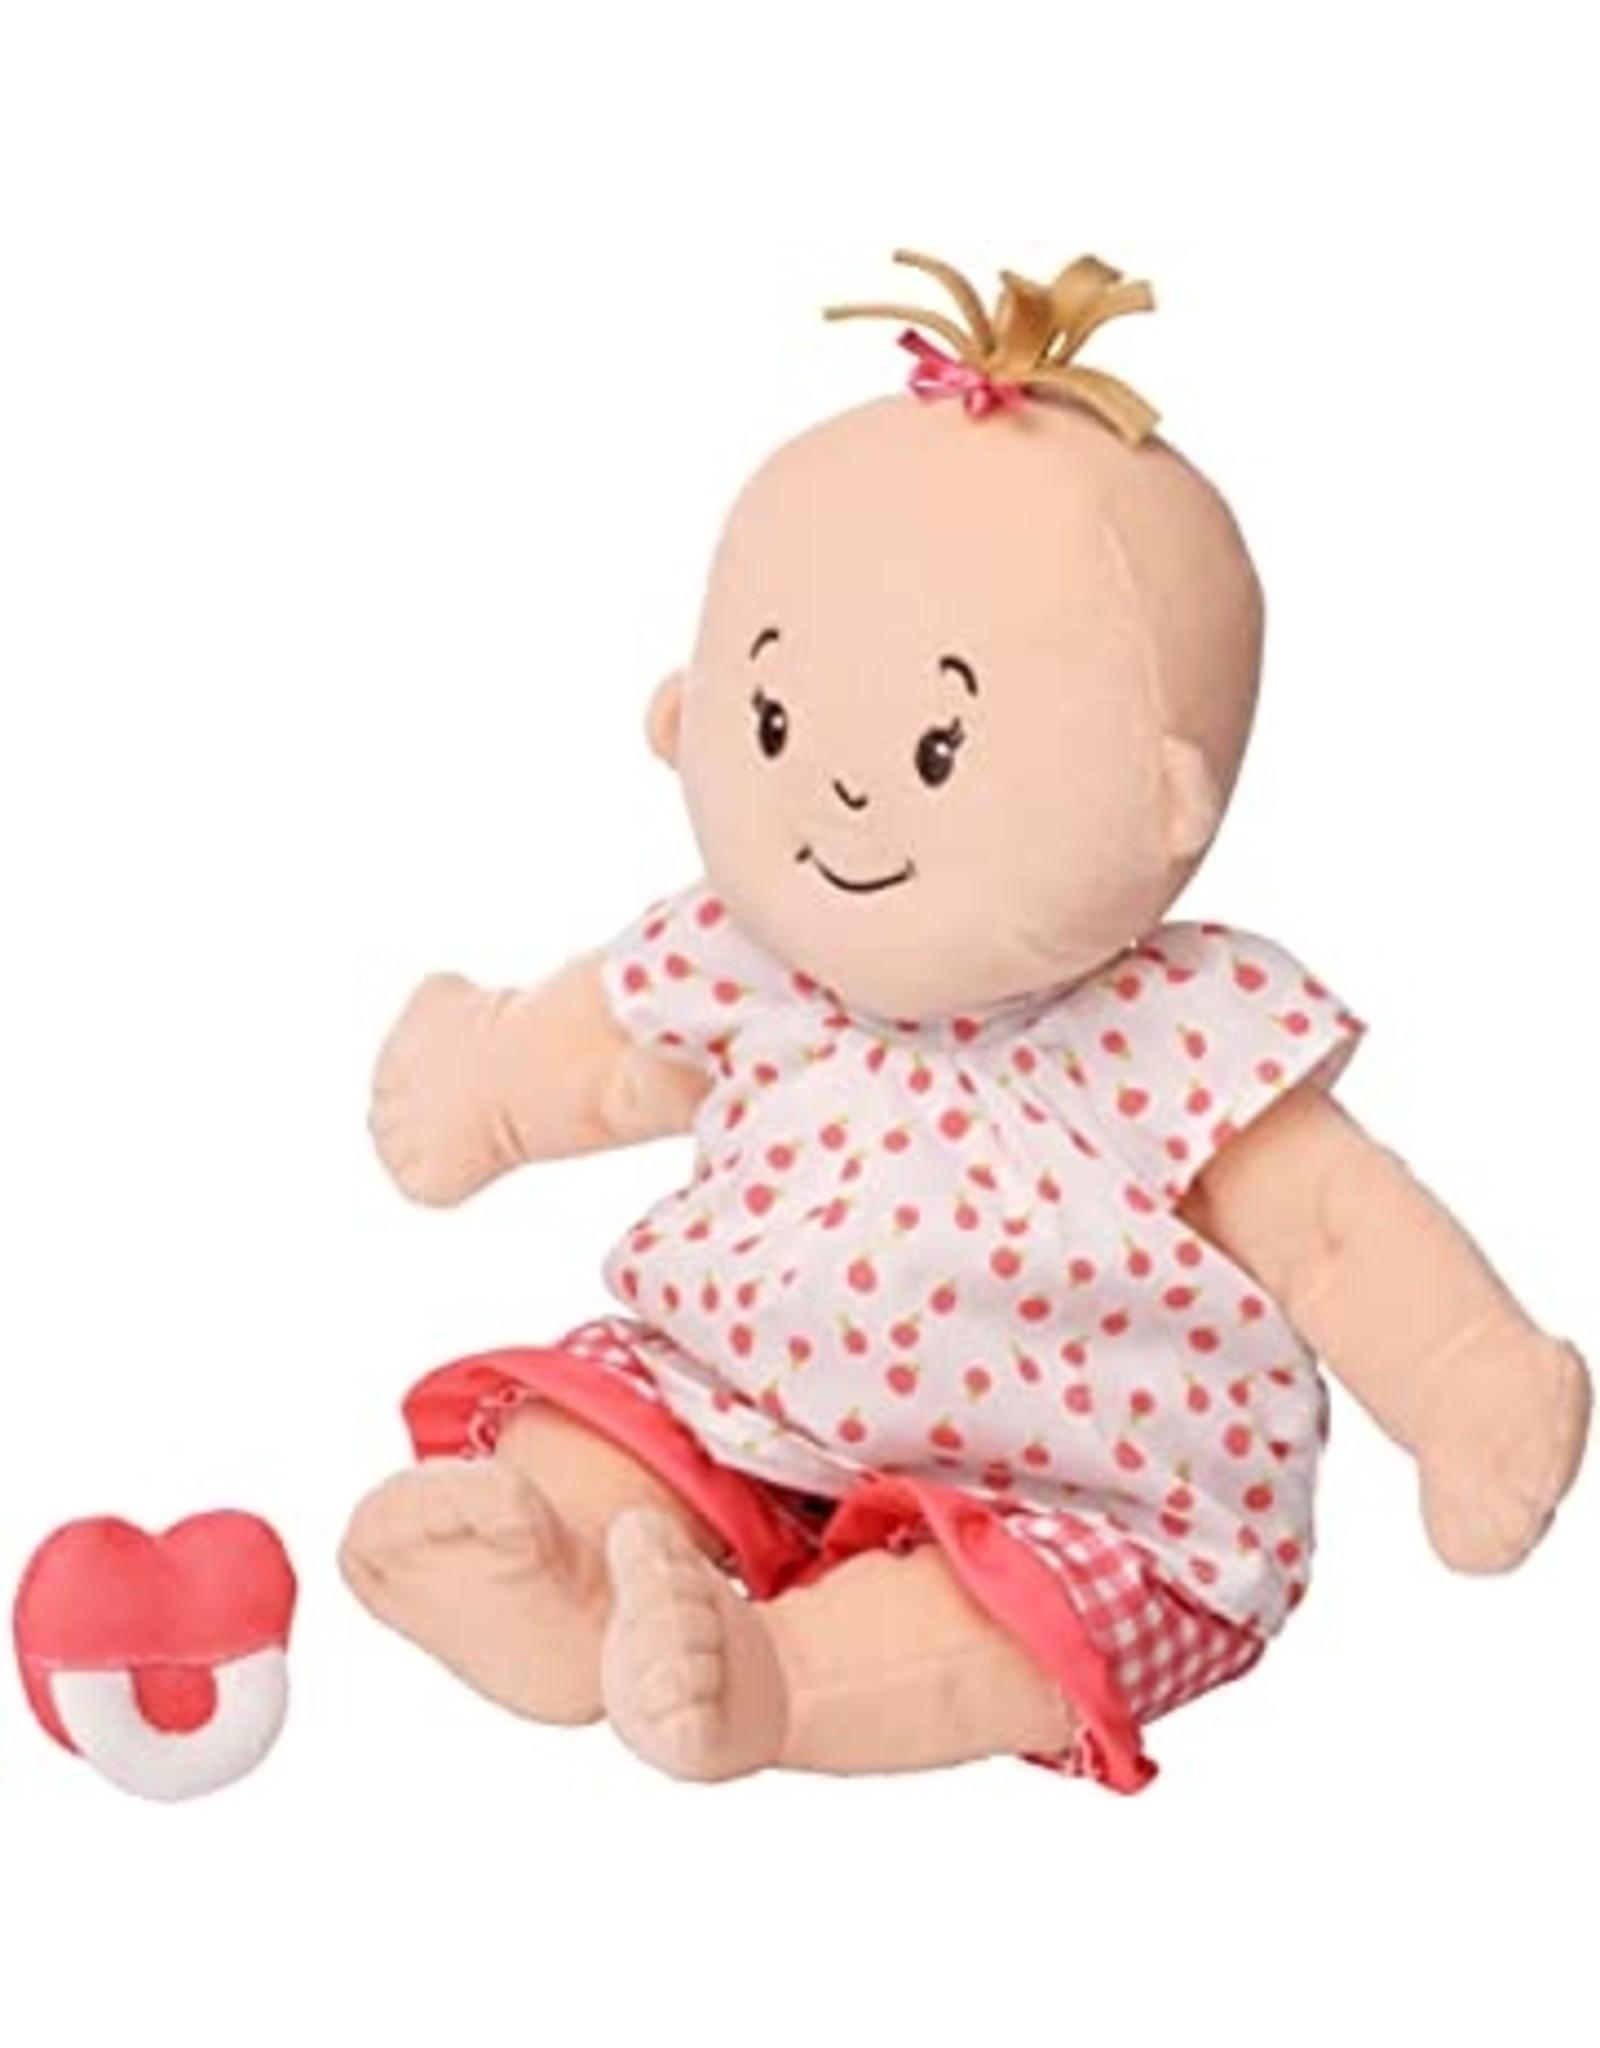 Manhattan Toy Baby Stella Peach Doll with Light Brown Hair